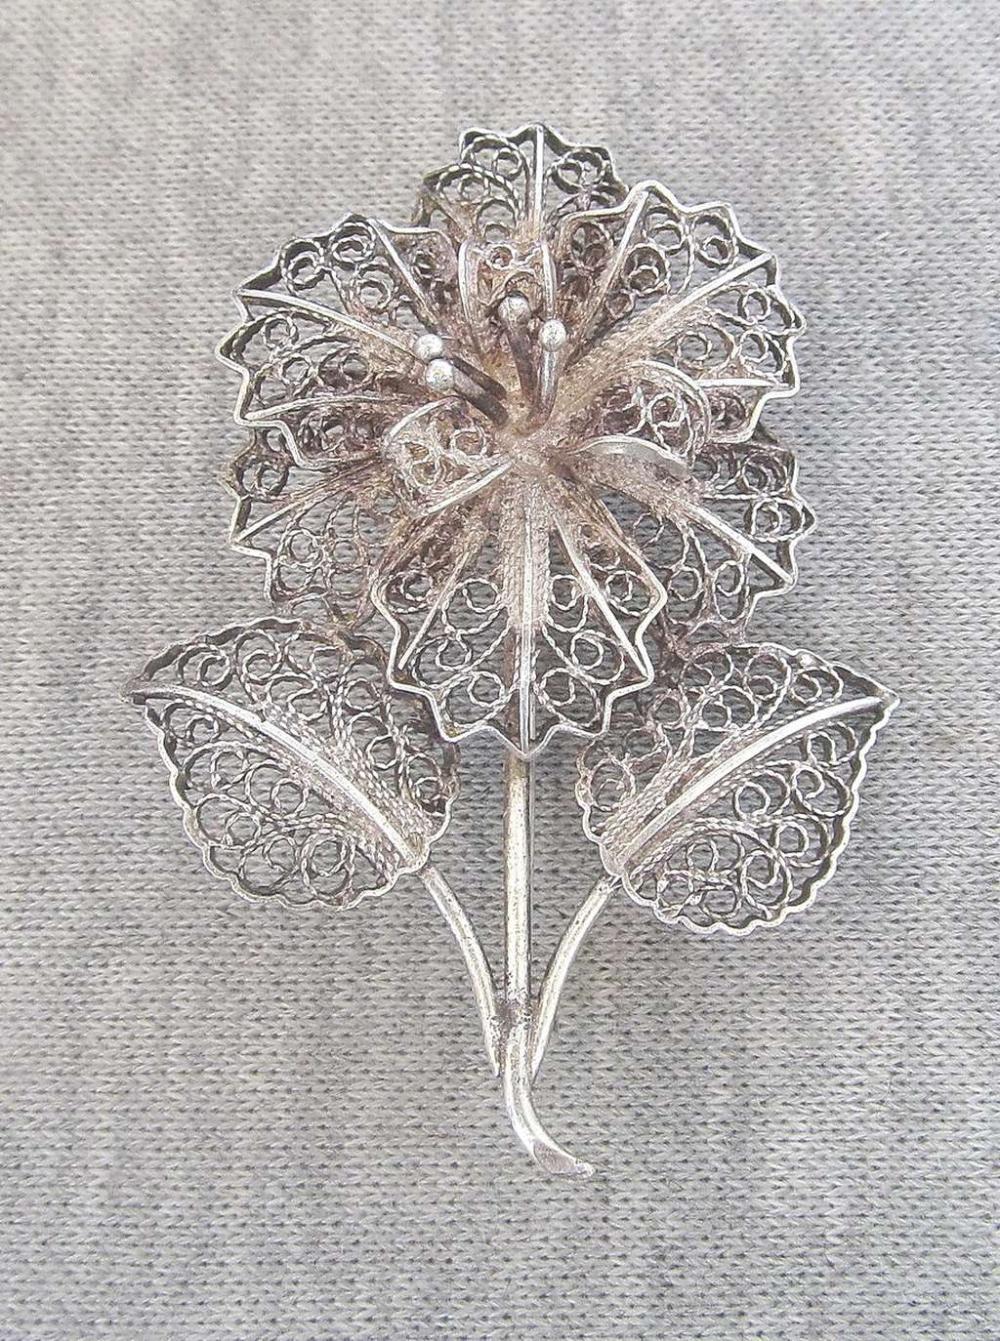 Vintage filigree silver sterling flower brooch.